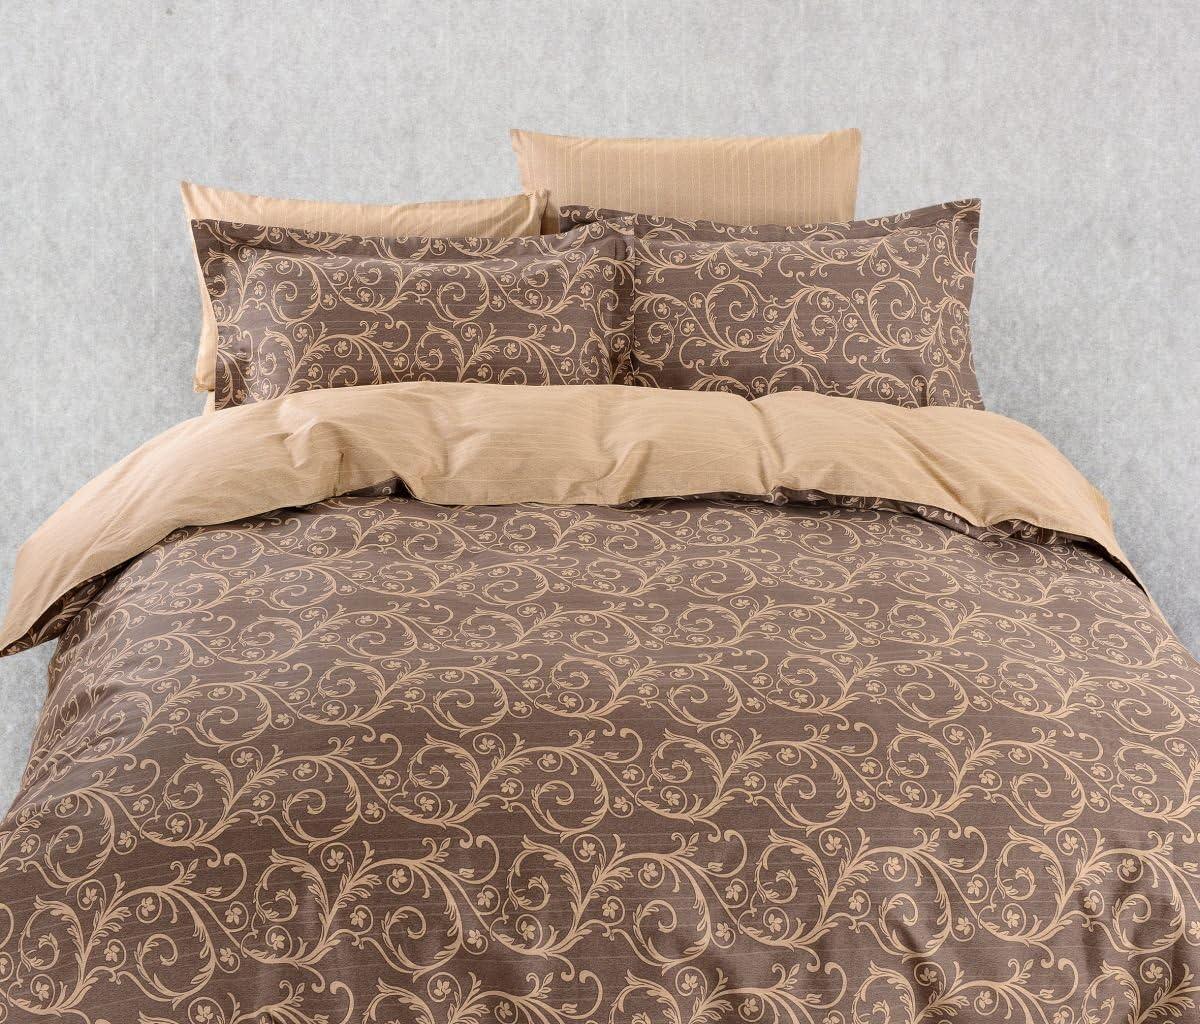 DM602Q Duvet Cover Max 44% OFF Sheets Set Superior Dolce Bolzano Size Queen Mela Bed